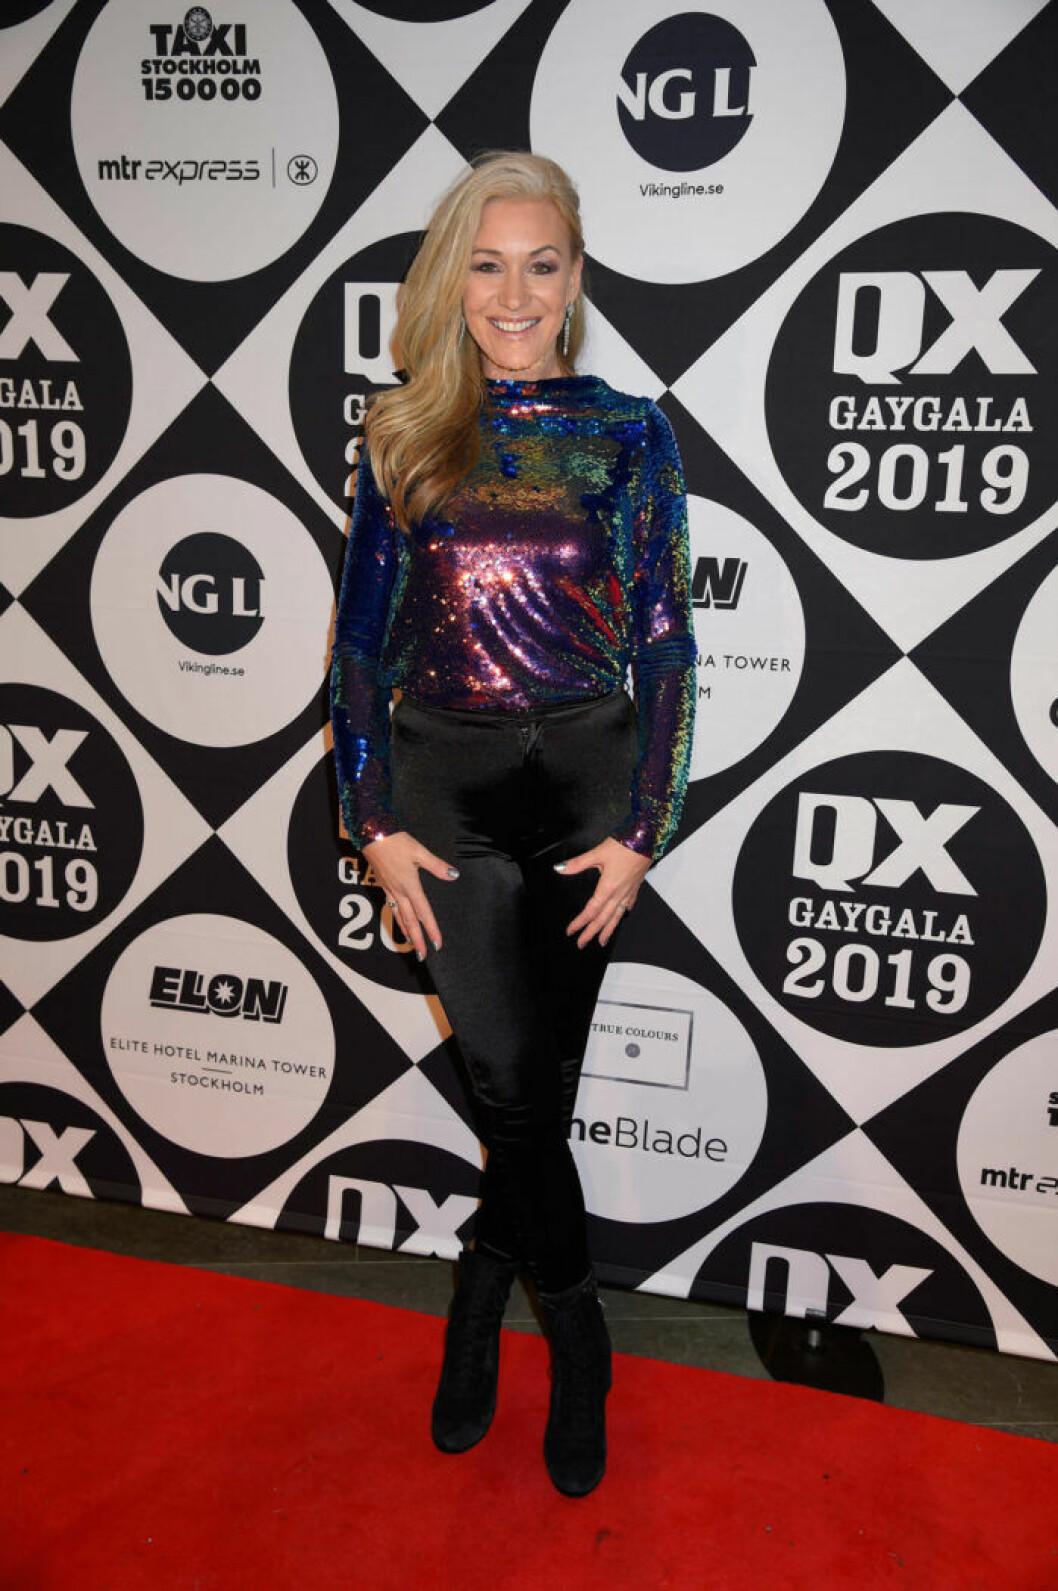 Jessica Andersson på QX-galan 2019